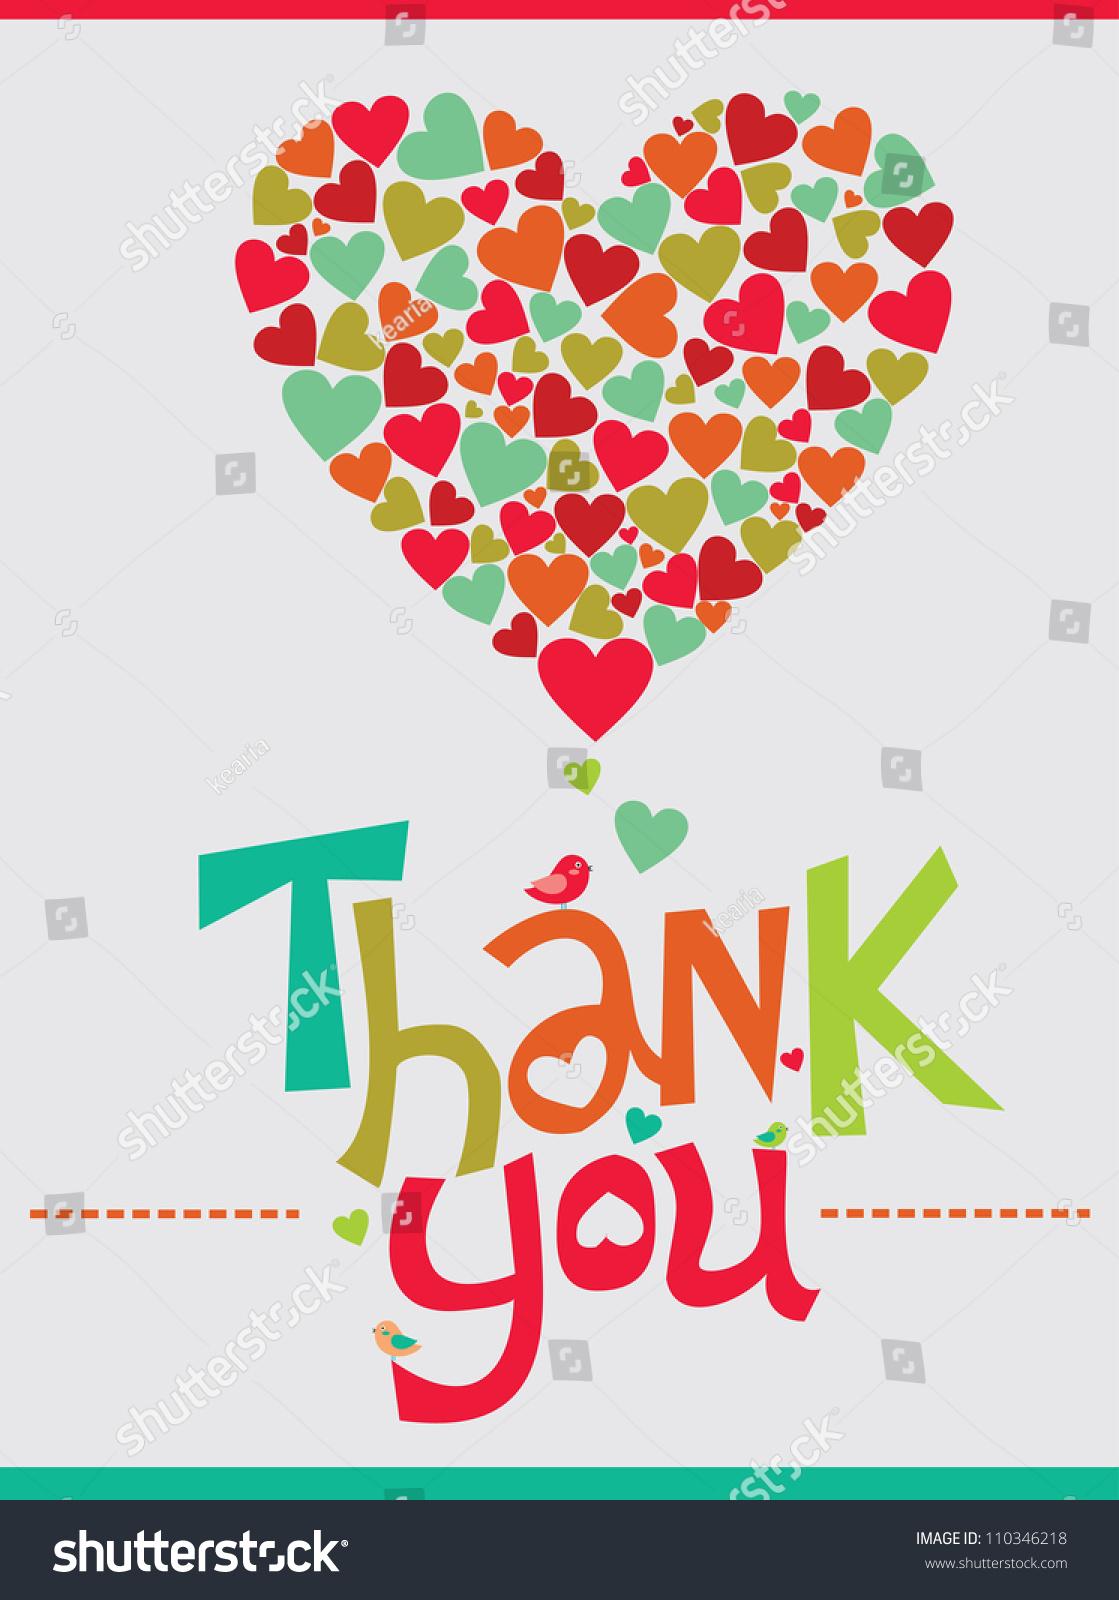 Thank You Card Design. Vector Illustration - 110346218 : Shutterstock